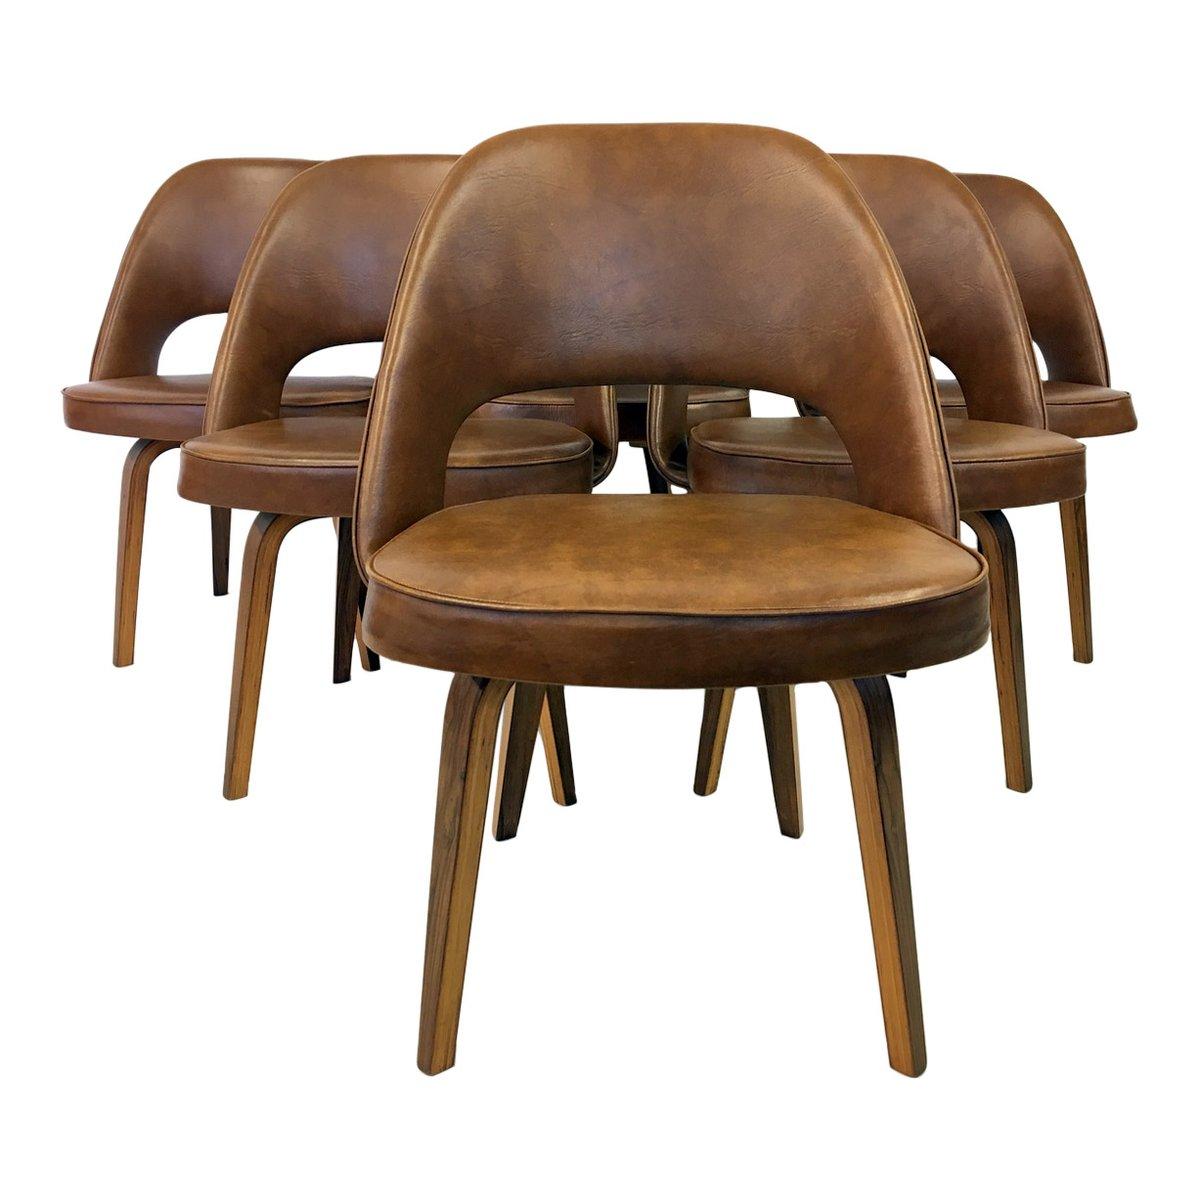 Chair saarinen executive chair - Vintage Executive Chairs By Eero Saarinen For Knoll Set Of 6